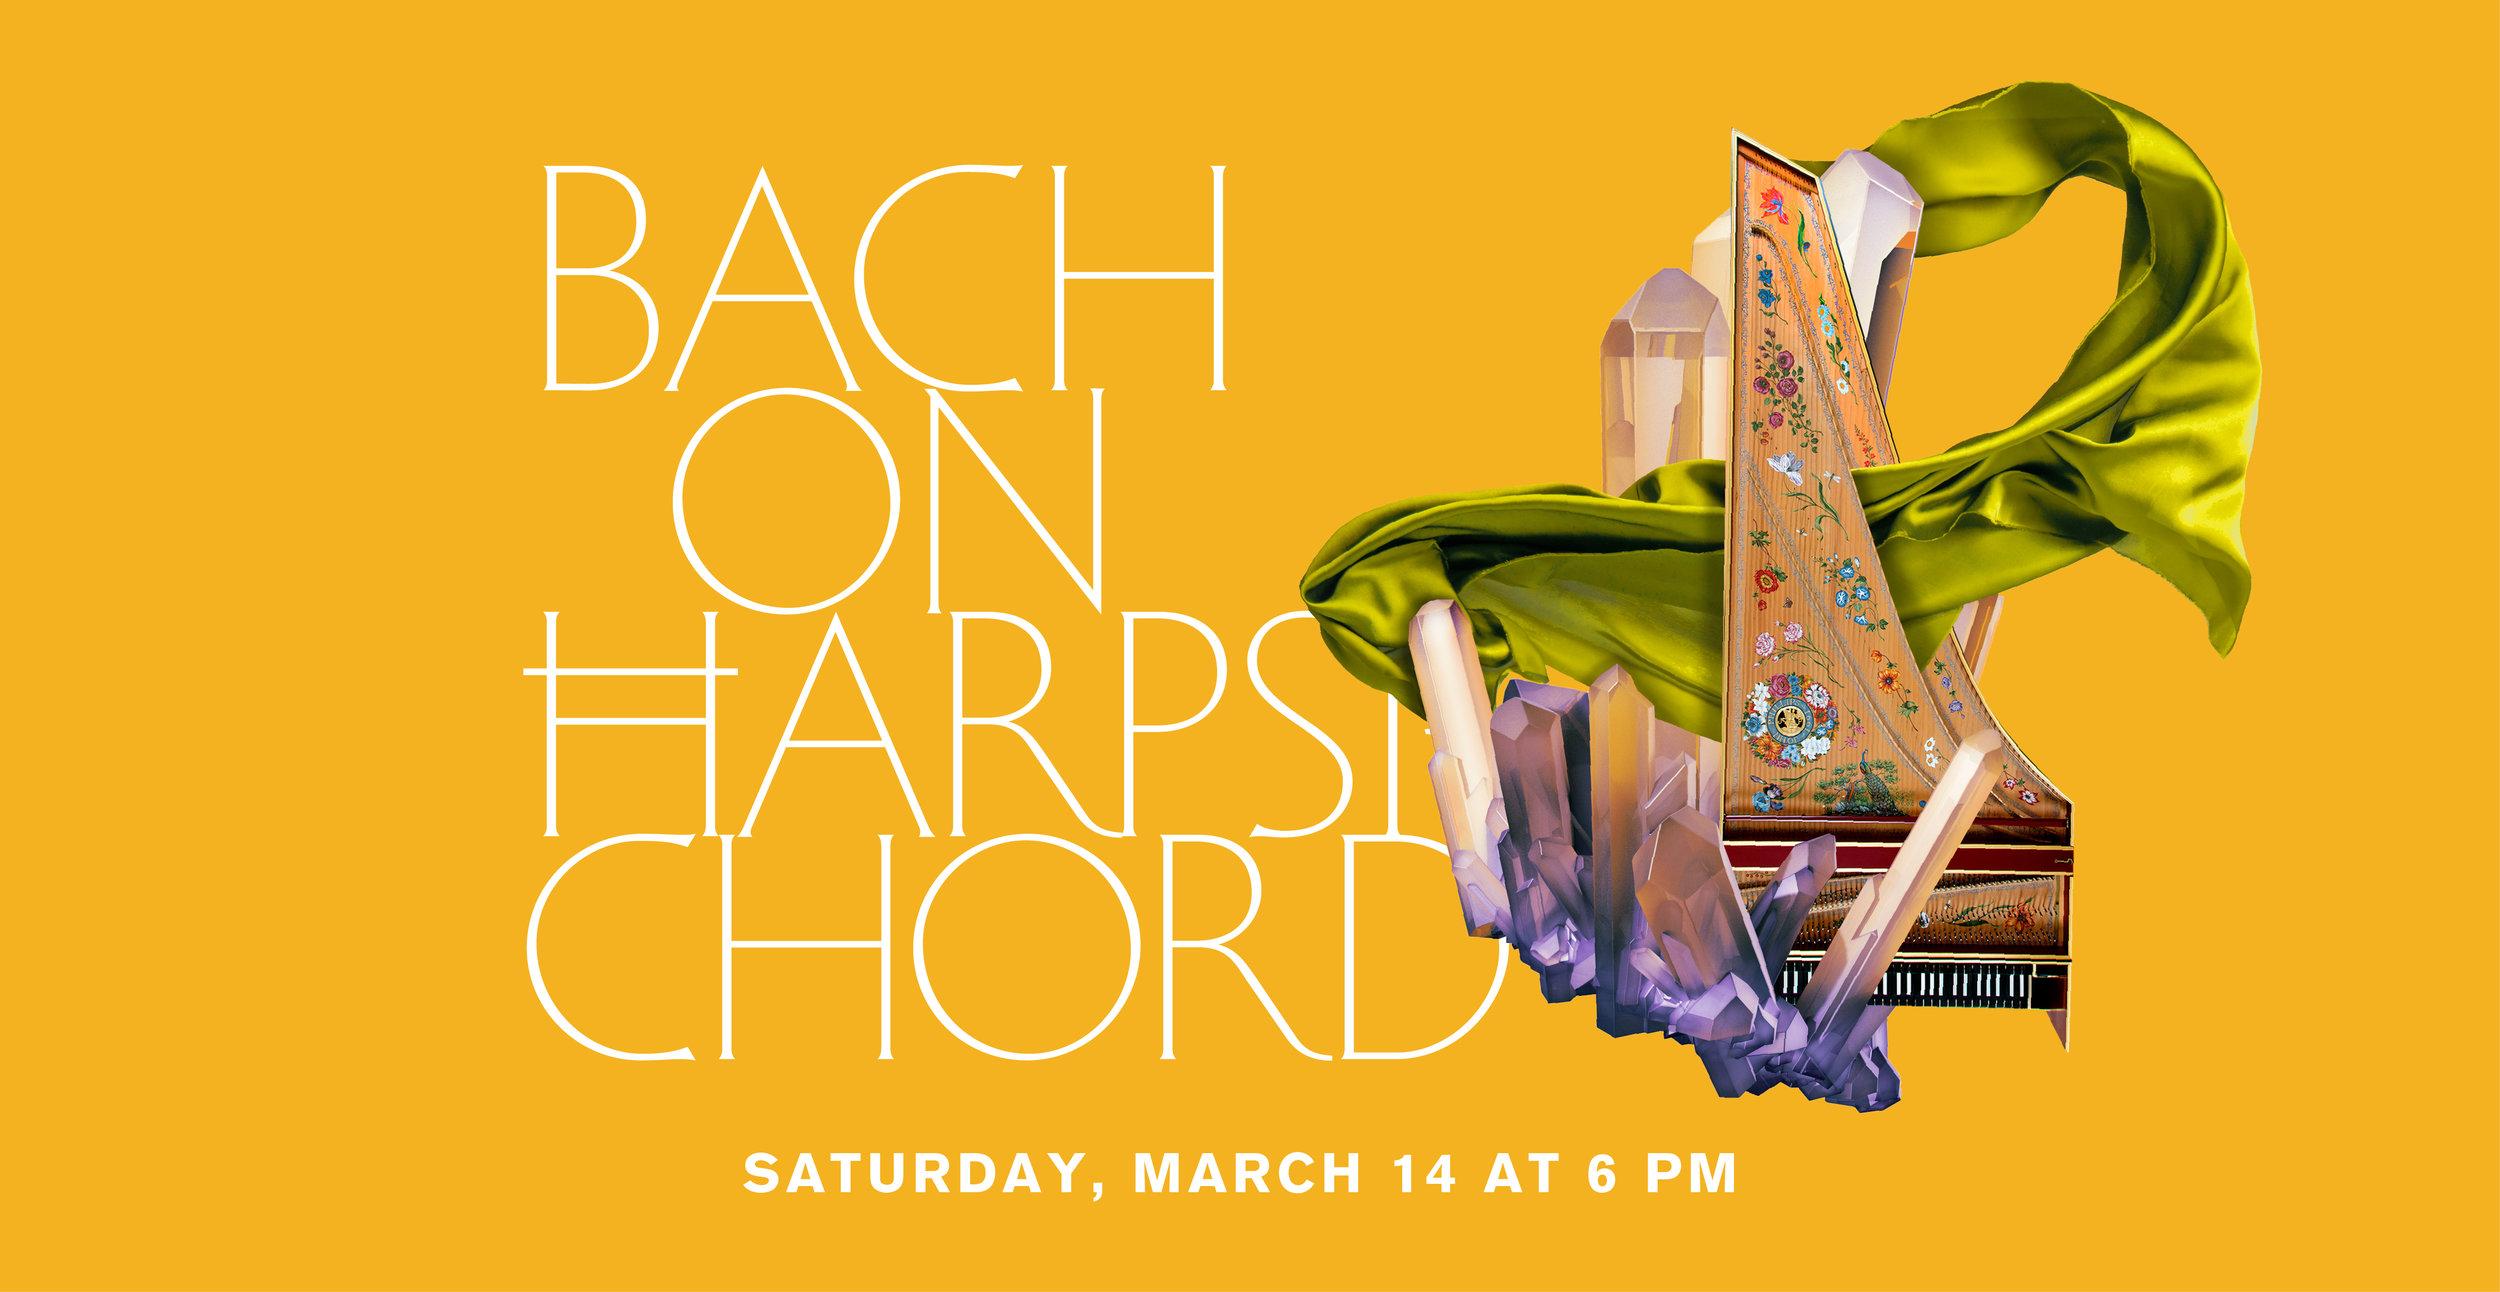 ALH-05 Bach on Harpsichord 1040x540.jpg